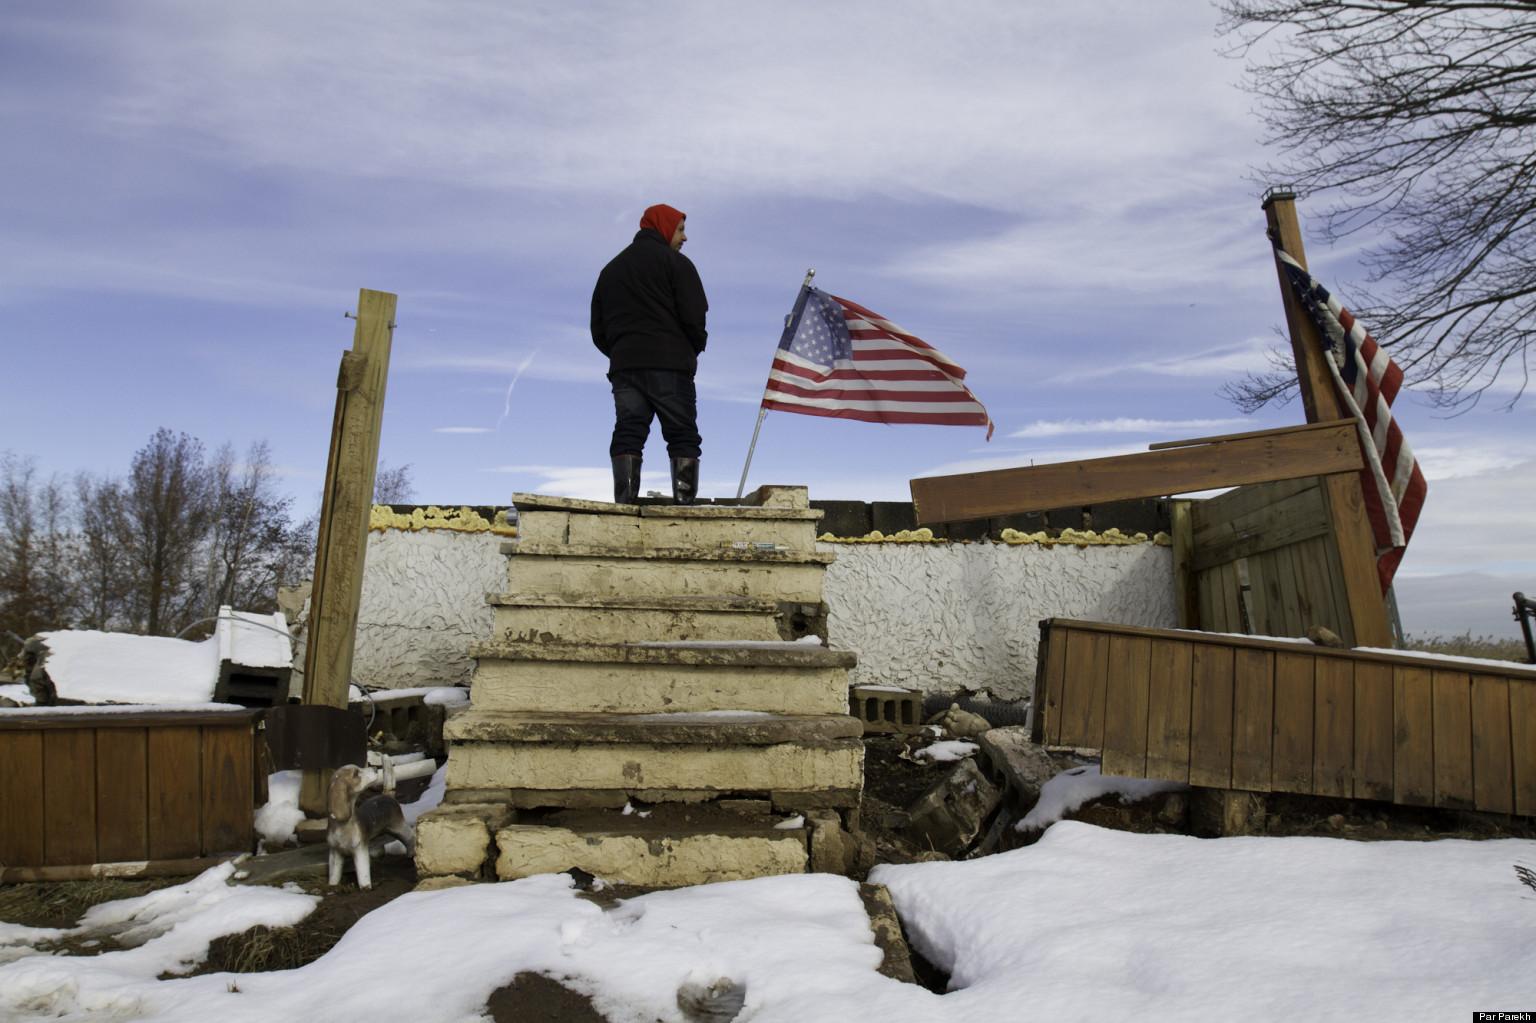 staten island u0026 39 s hurricane sandy damage sheds light on